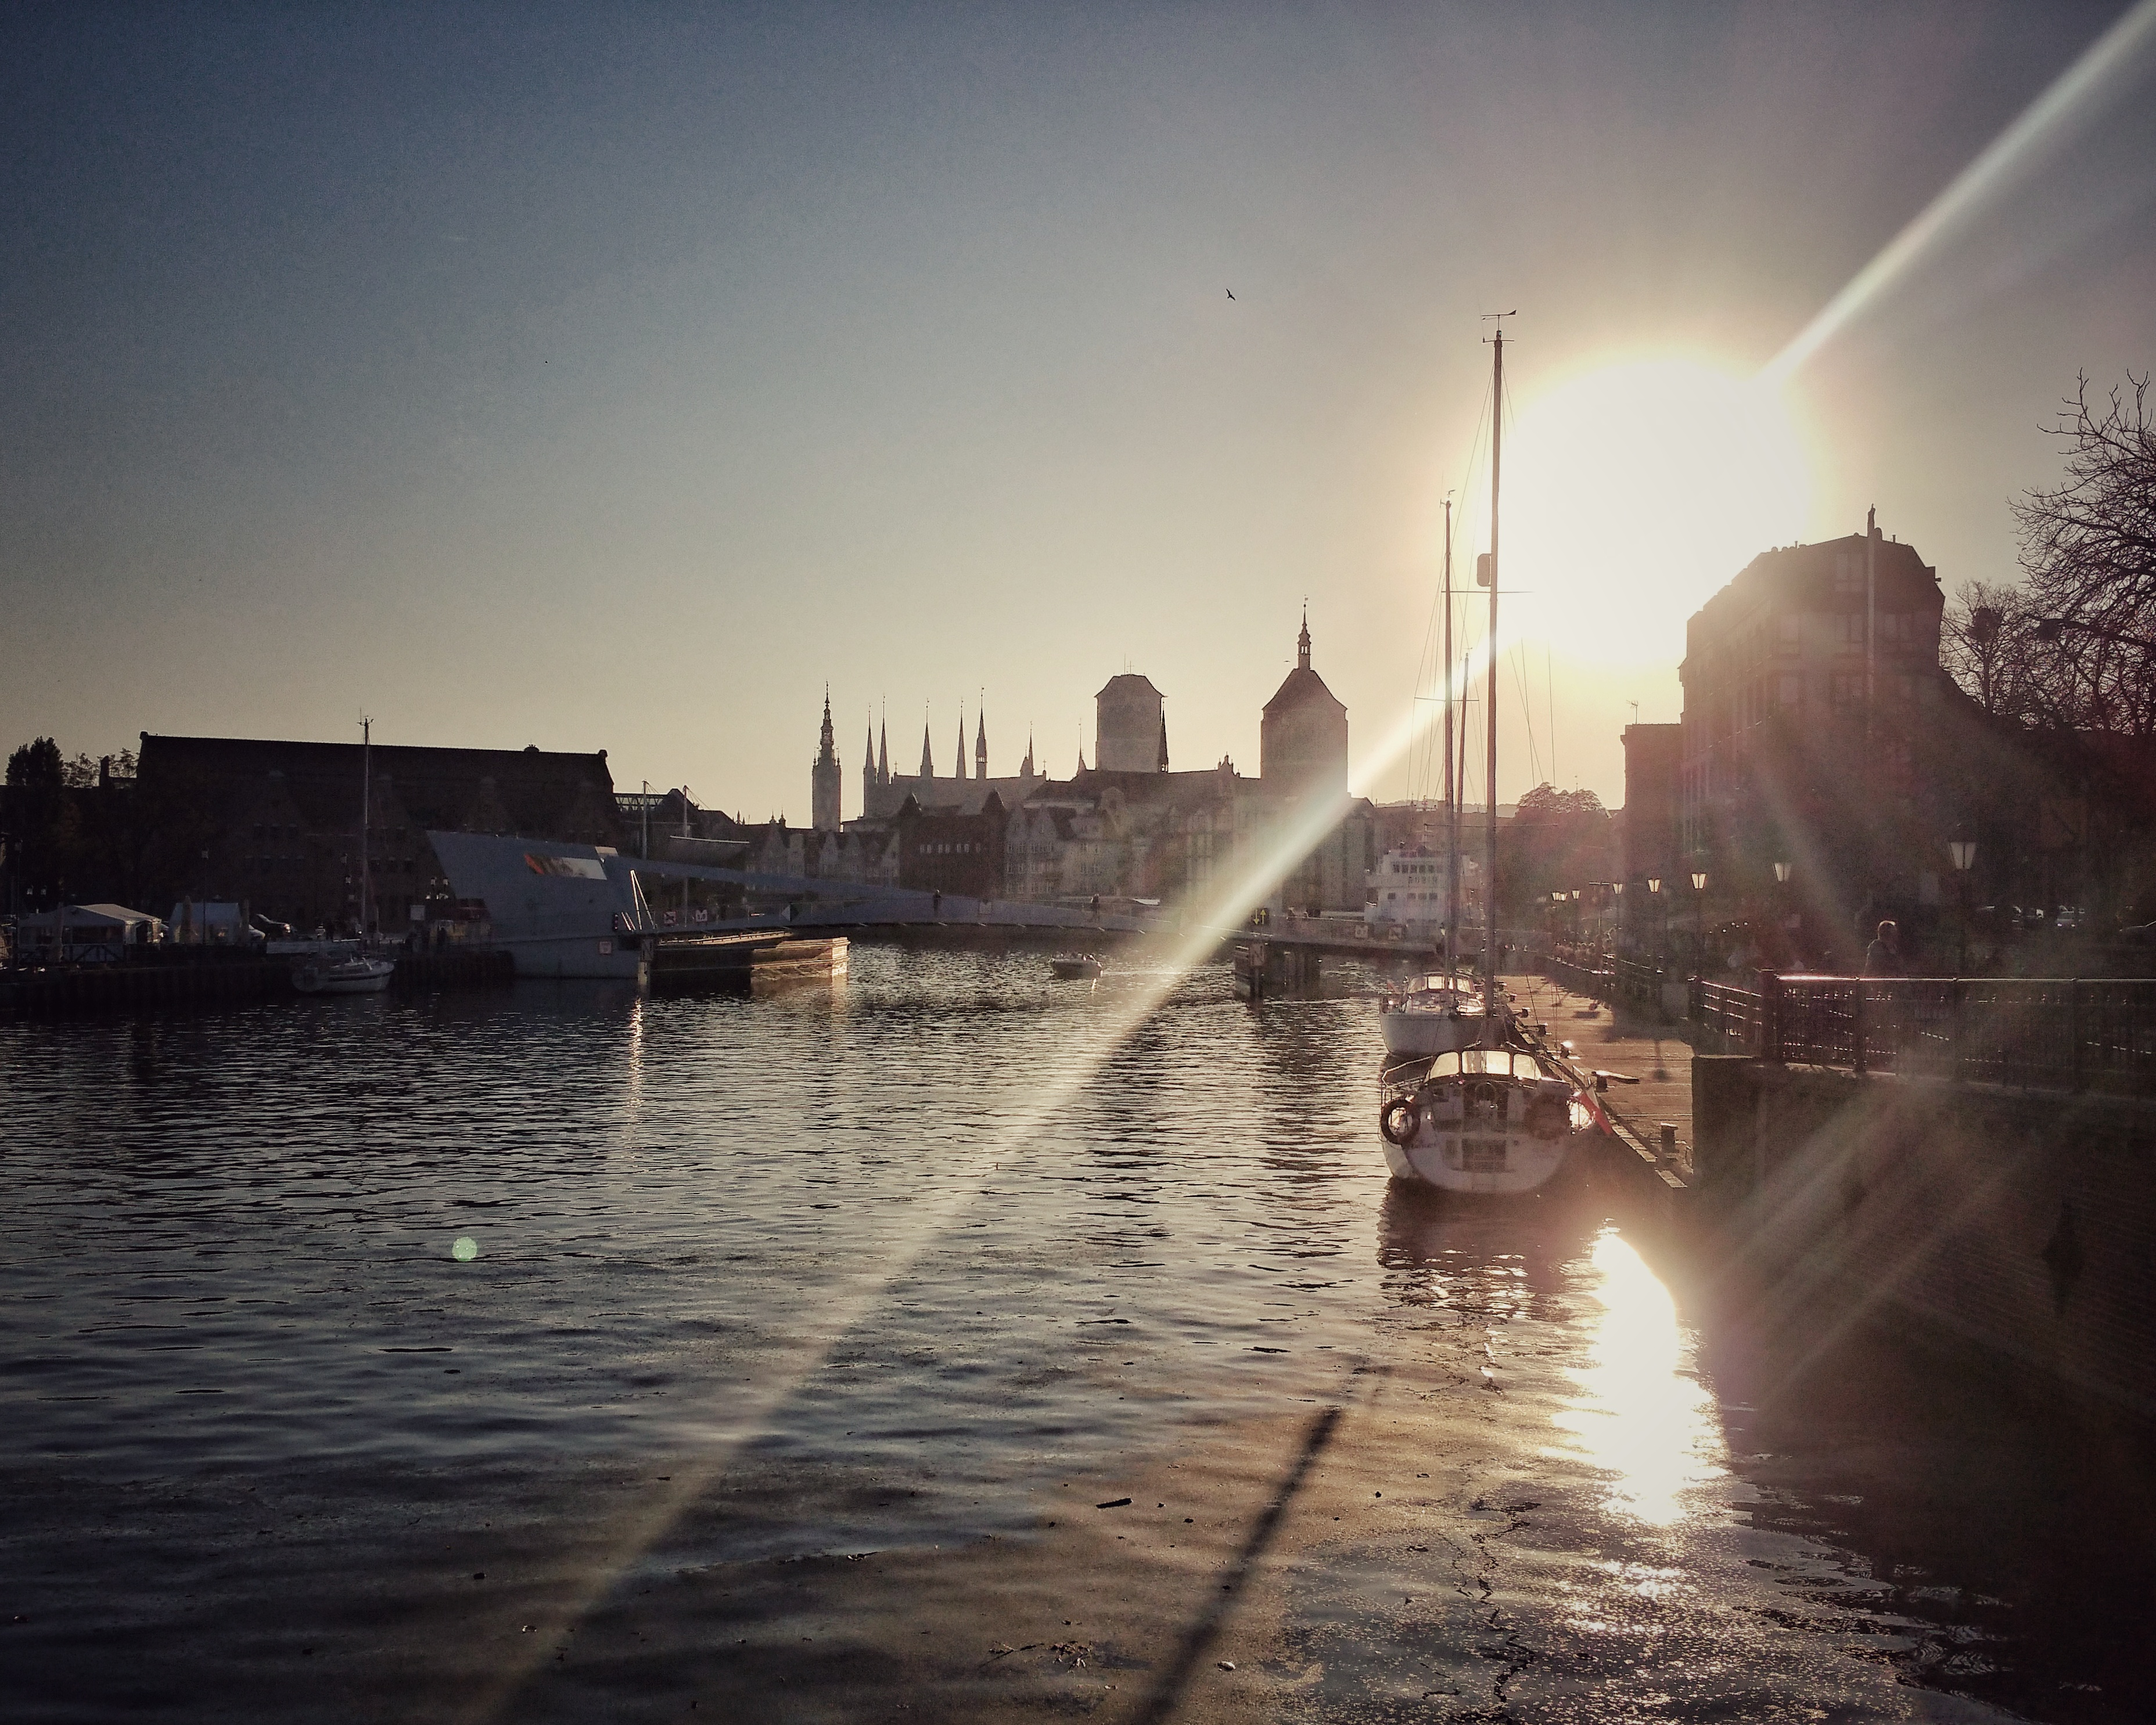 Sonnenuntergang, Gdansk | ©Anne Seubert